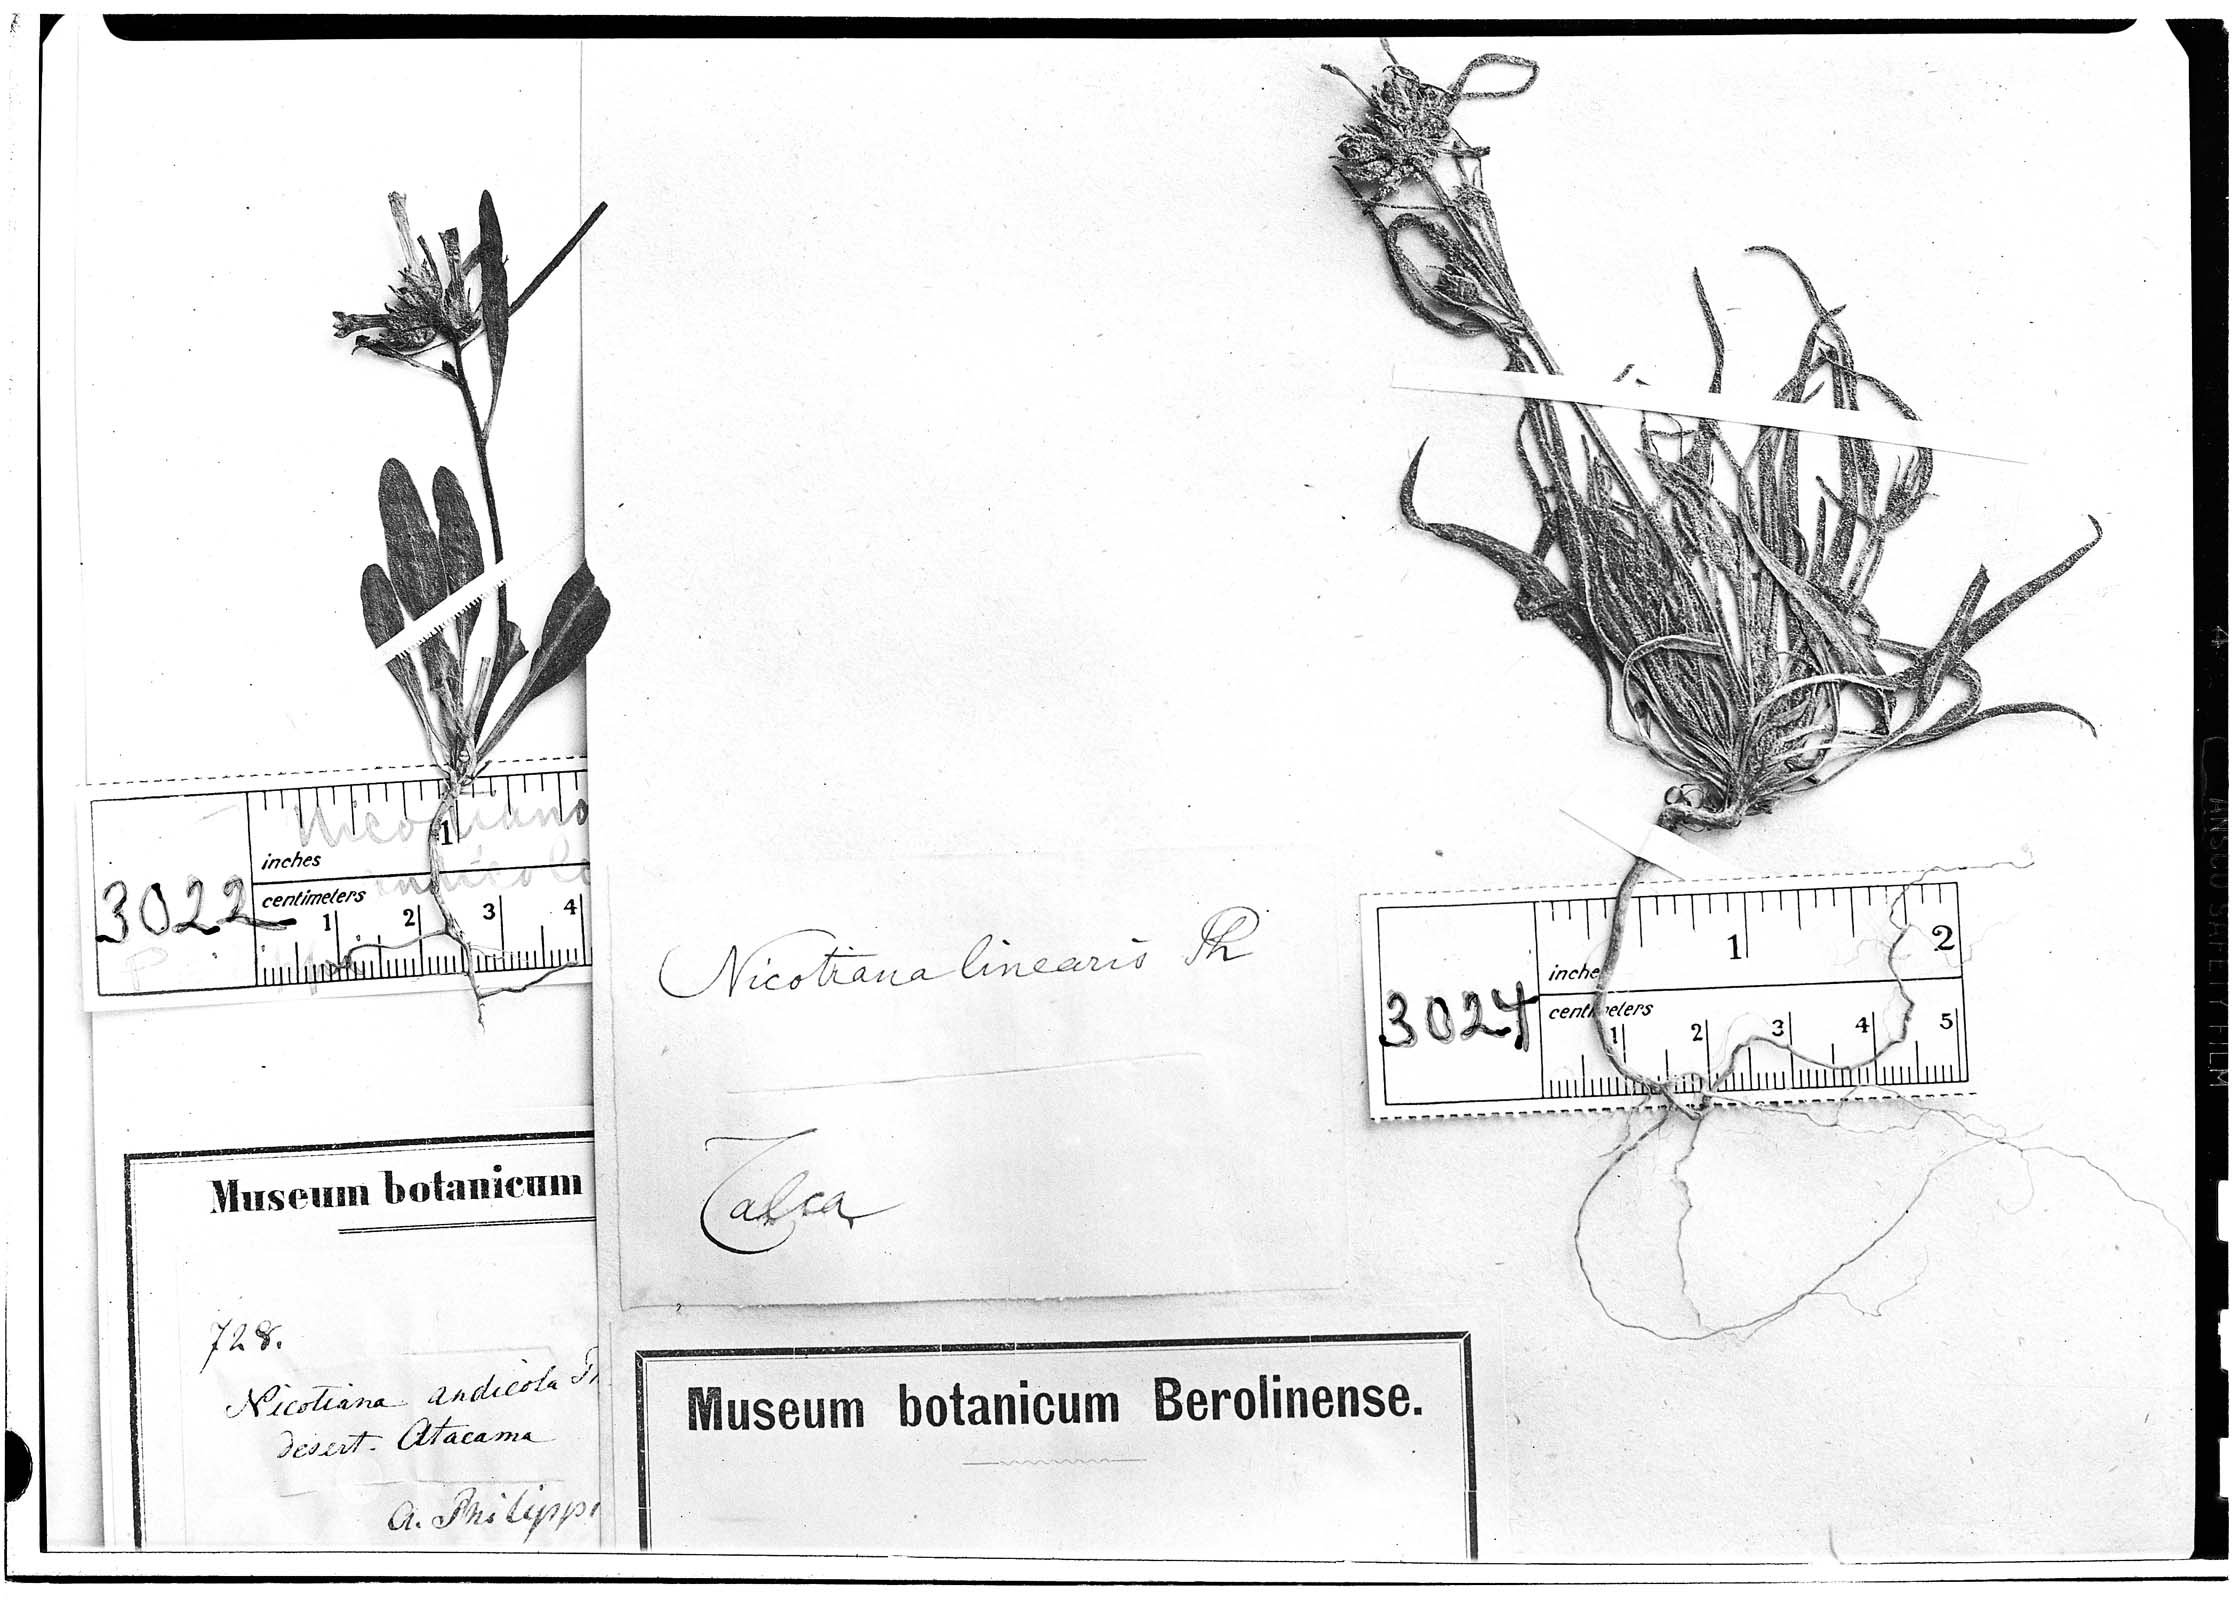 Nicotiana linearis image